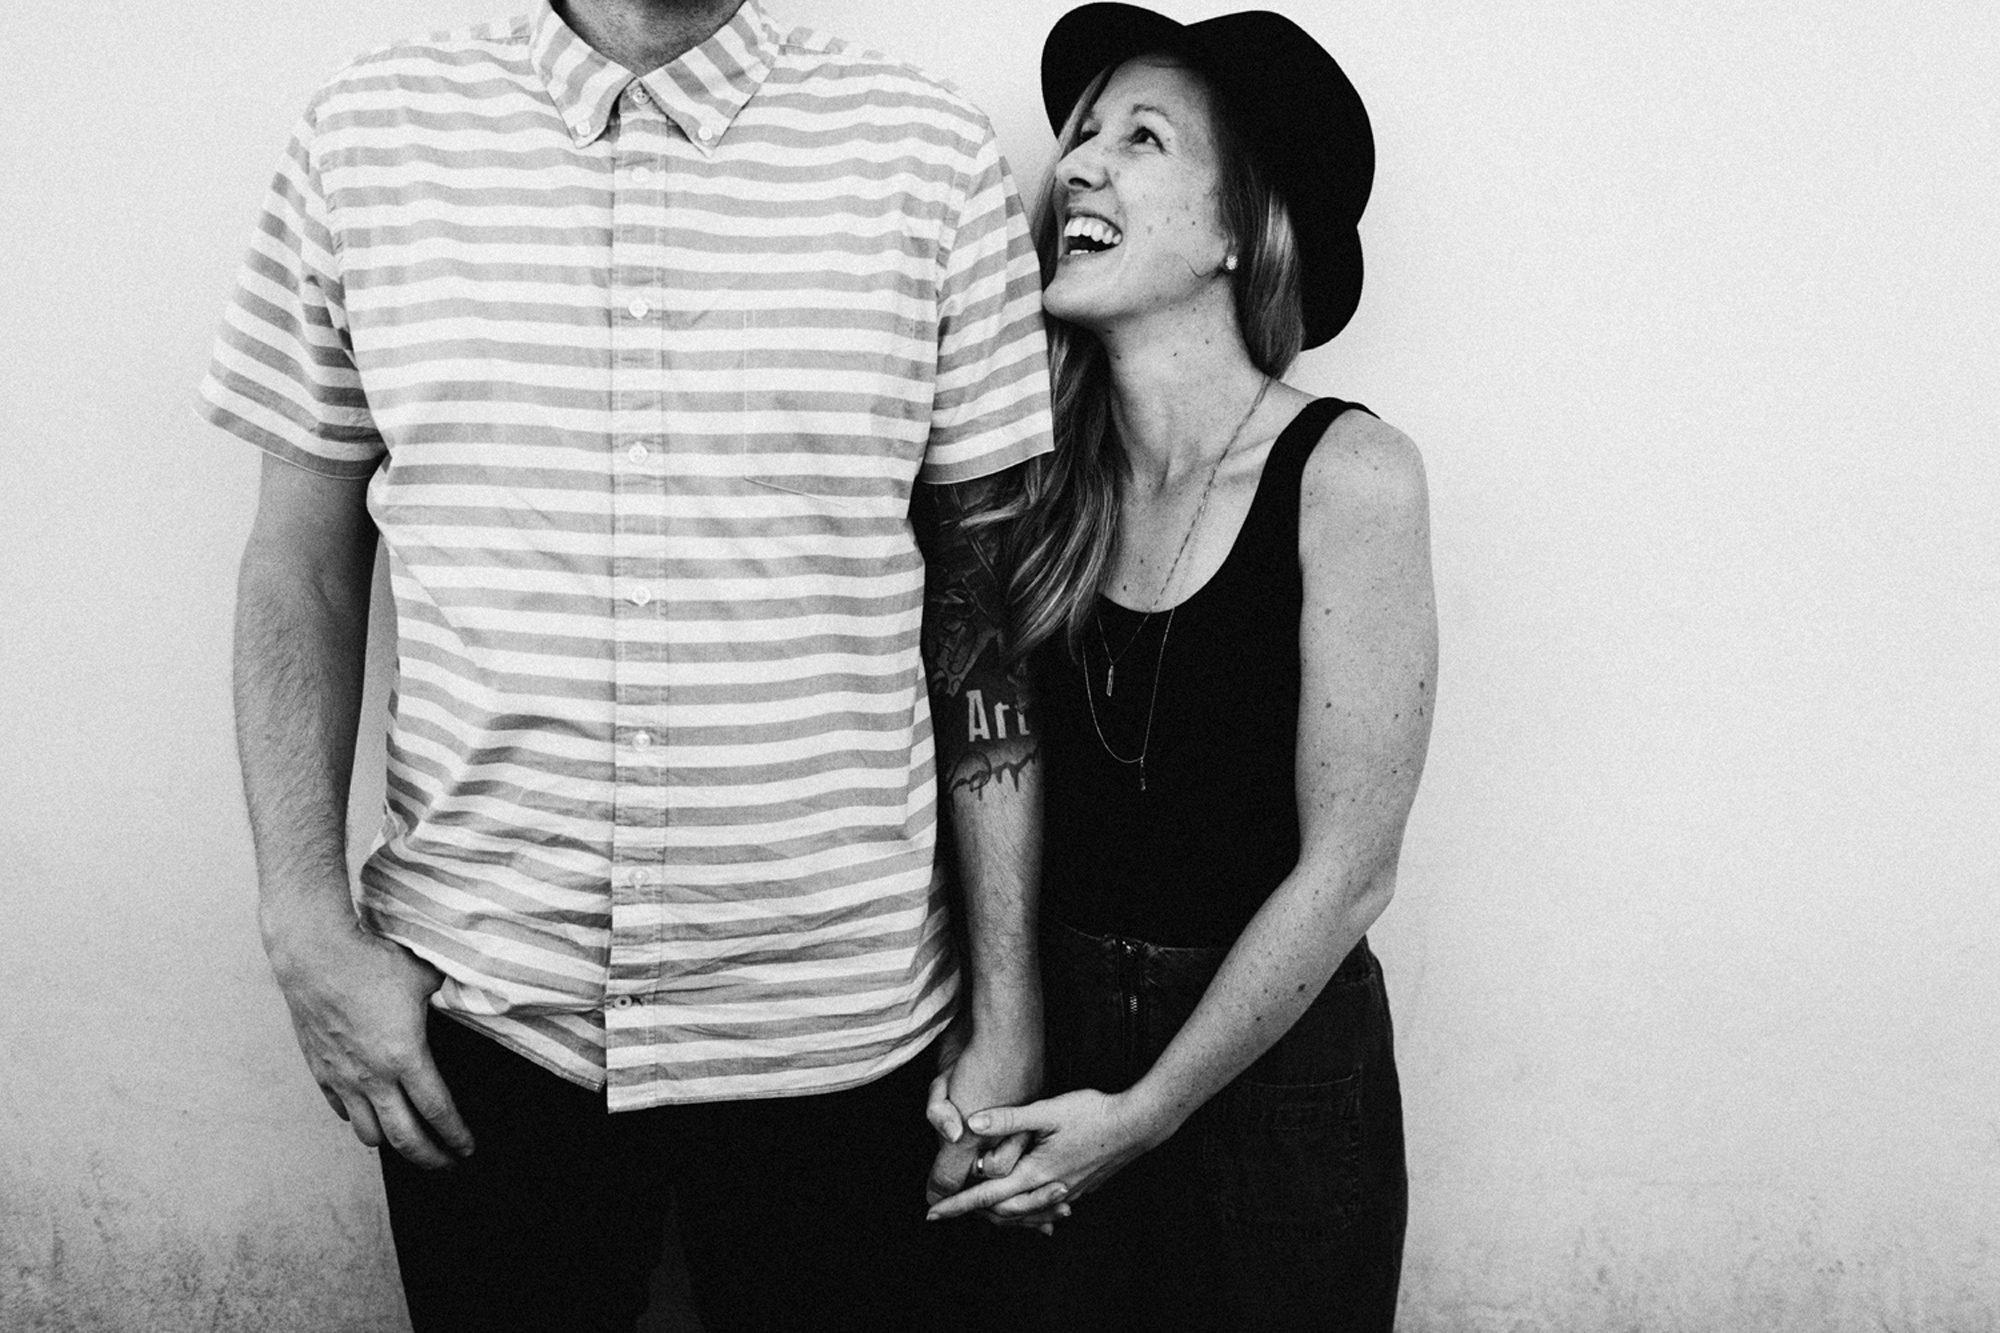 022-california-couple.jpg